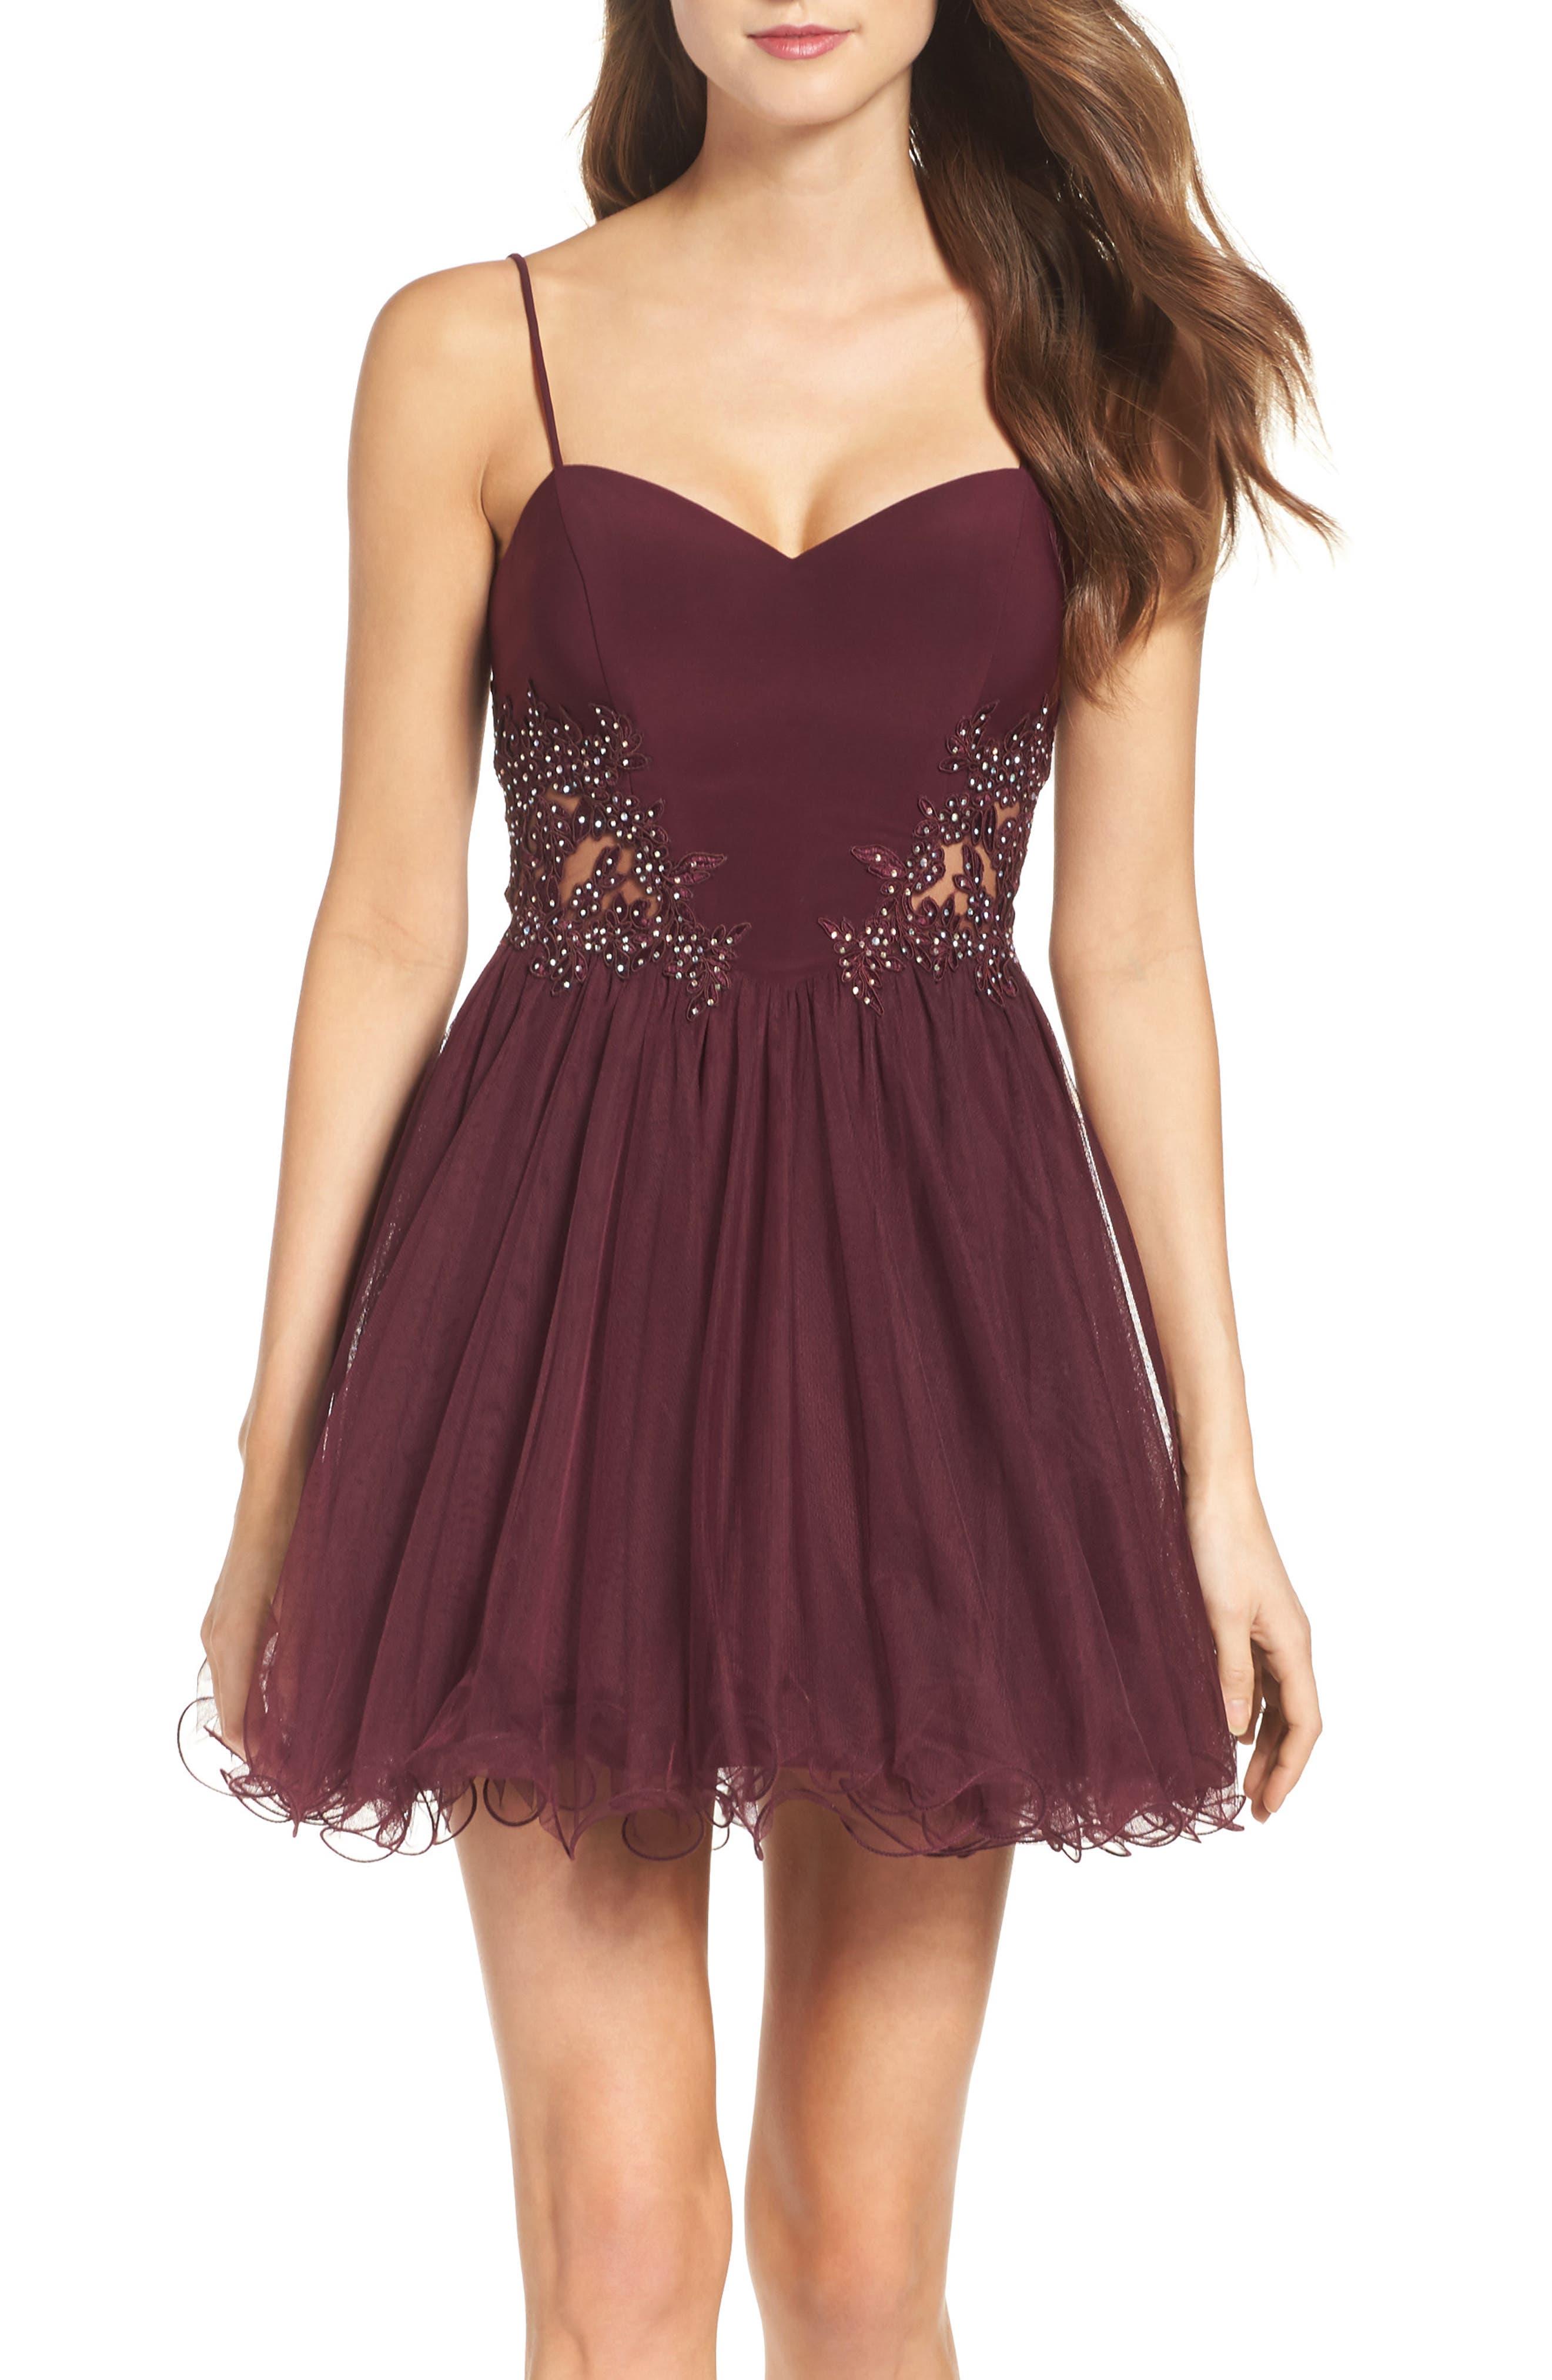 Alternate Image 1 Selected - Blondie Nites Embellished Fit & Flare Dress